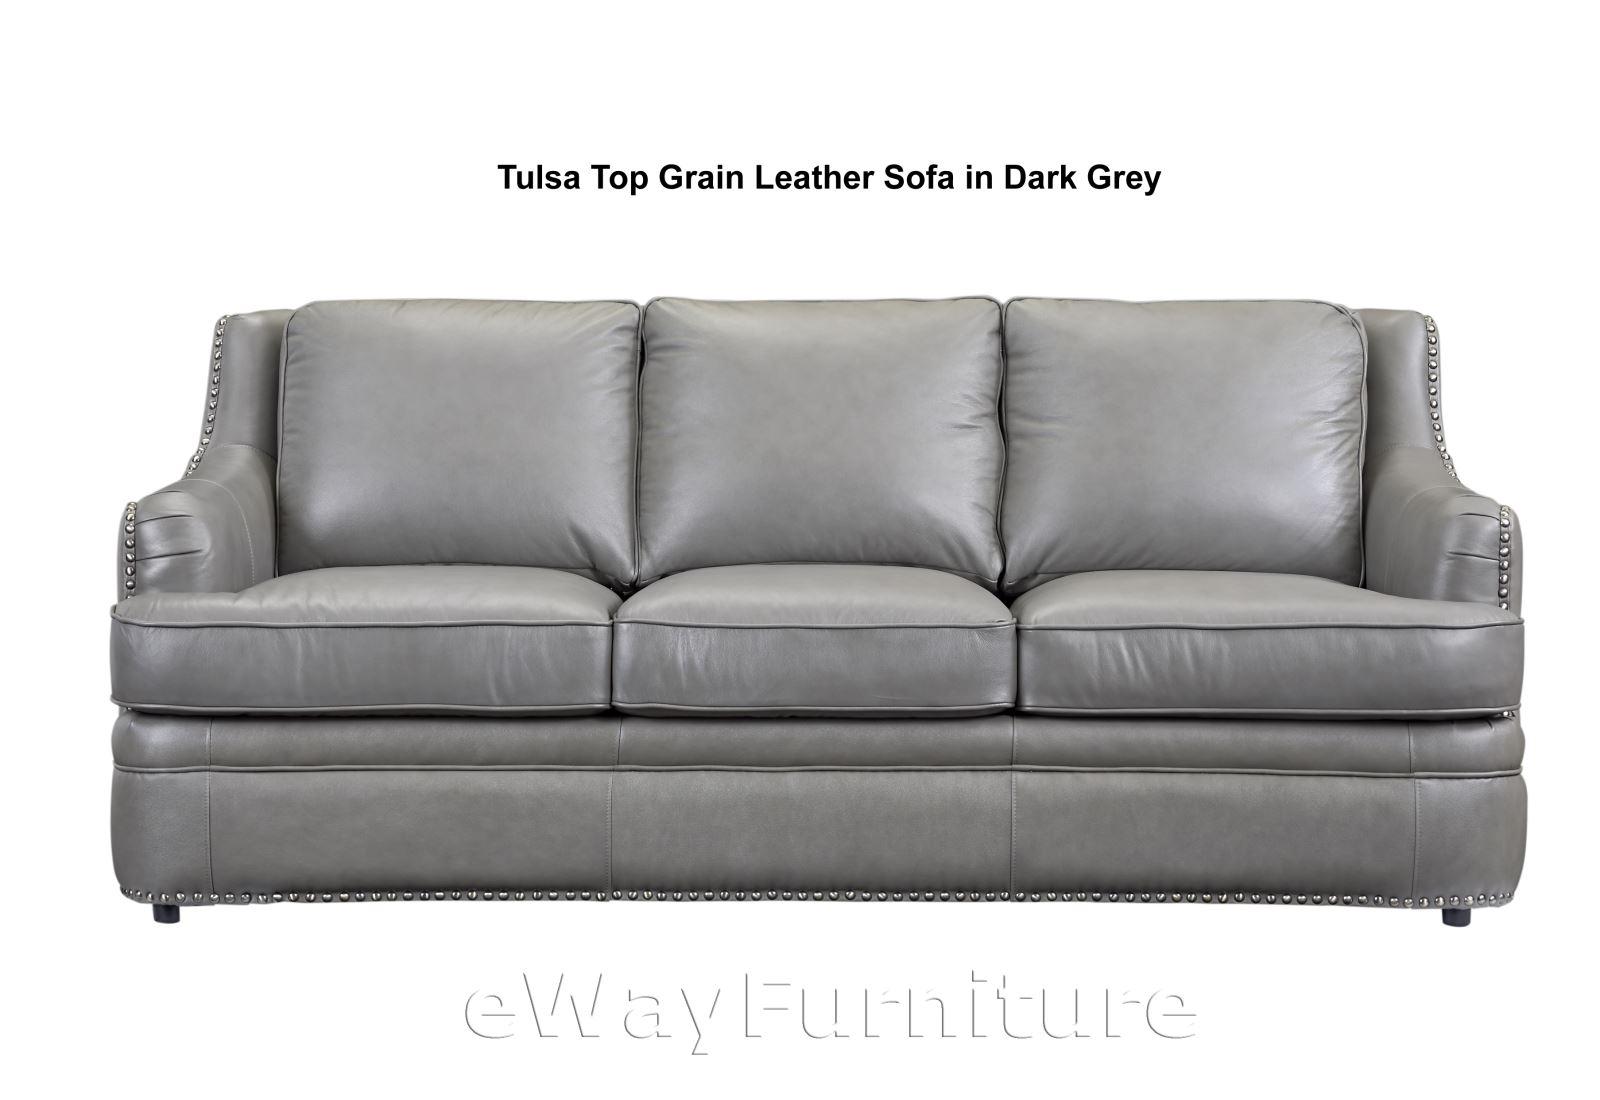 leather sofas in tulsa ok sofa accent pillow covers top grain dark grey